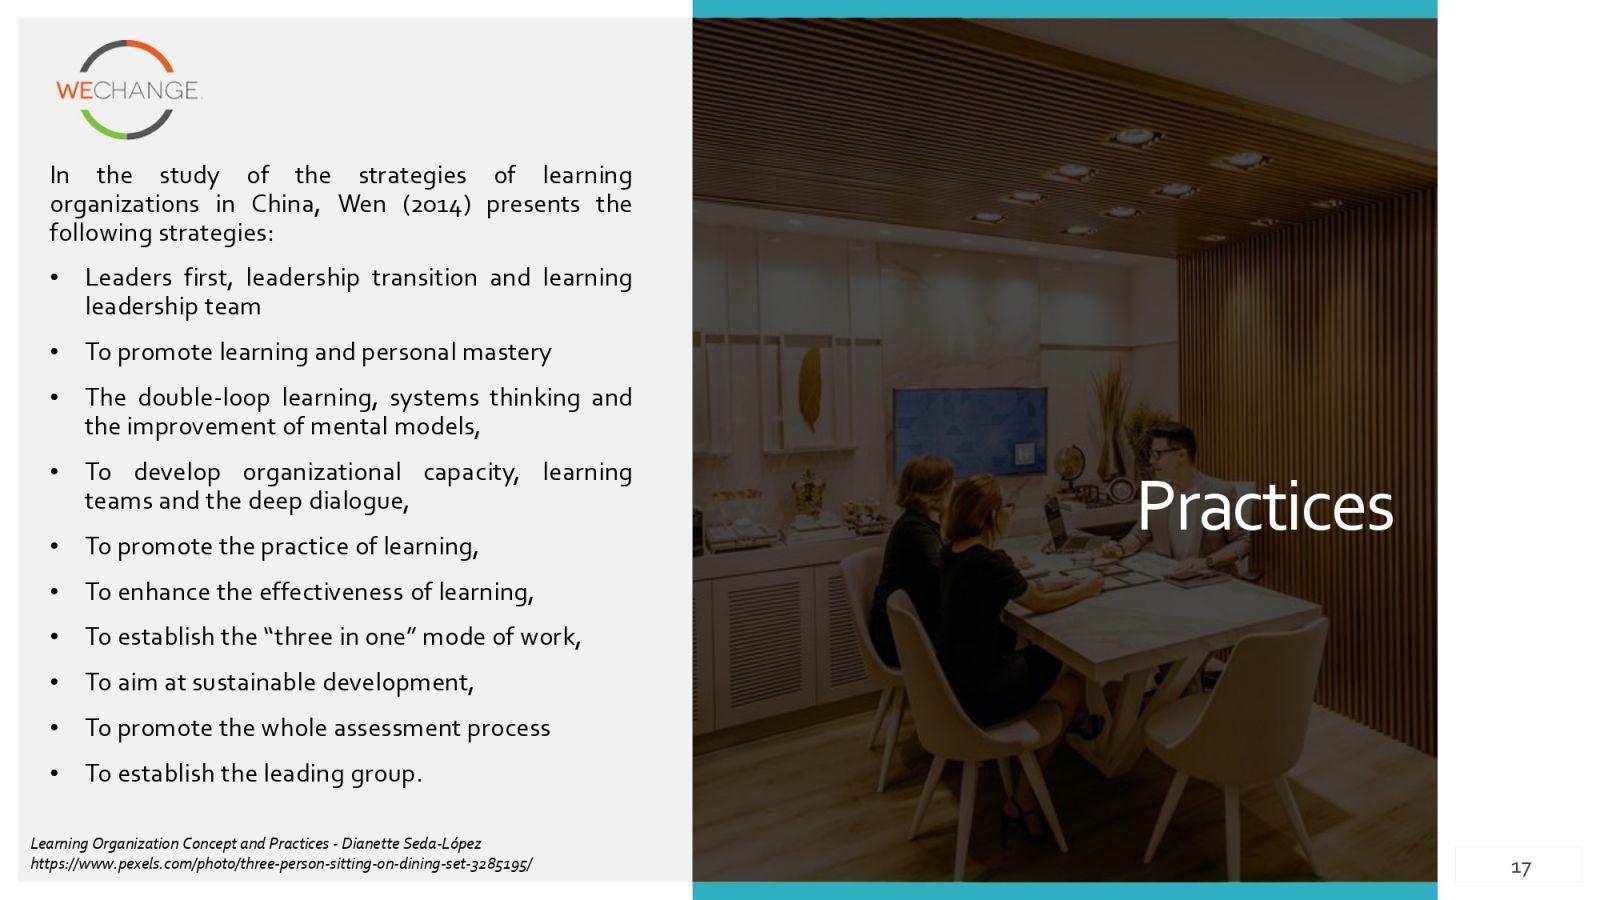 learnin organization in practice page 0010 compressed The learning organization in practice